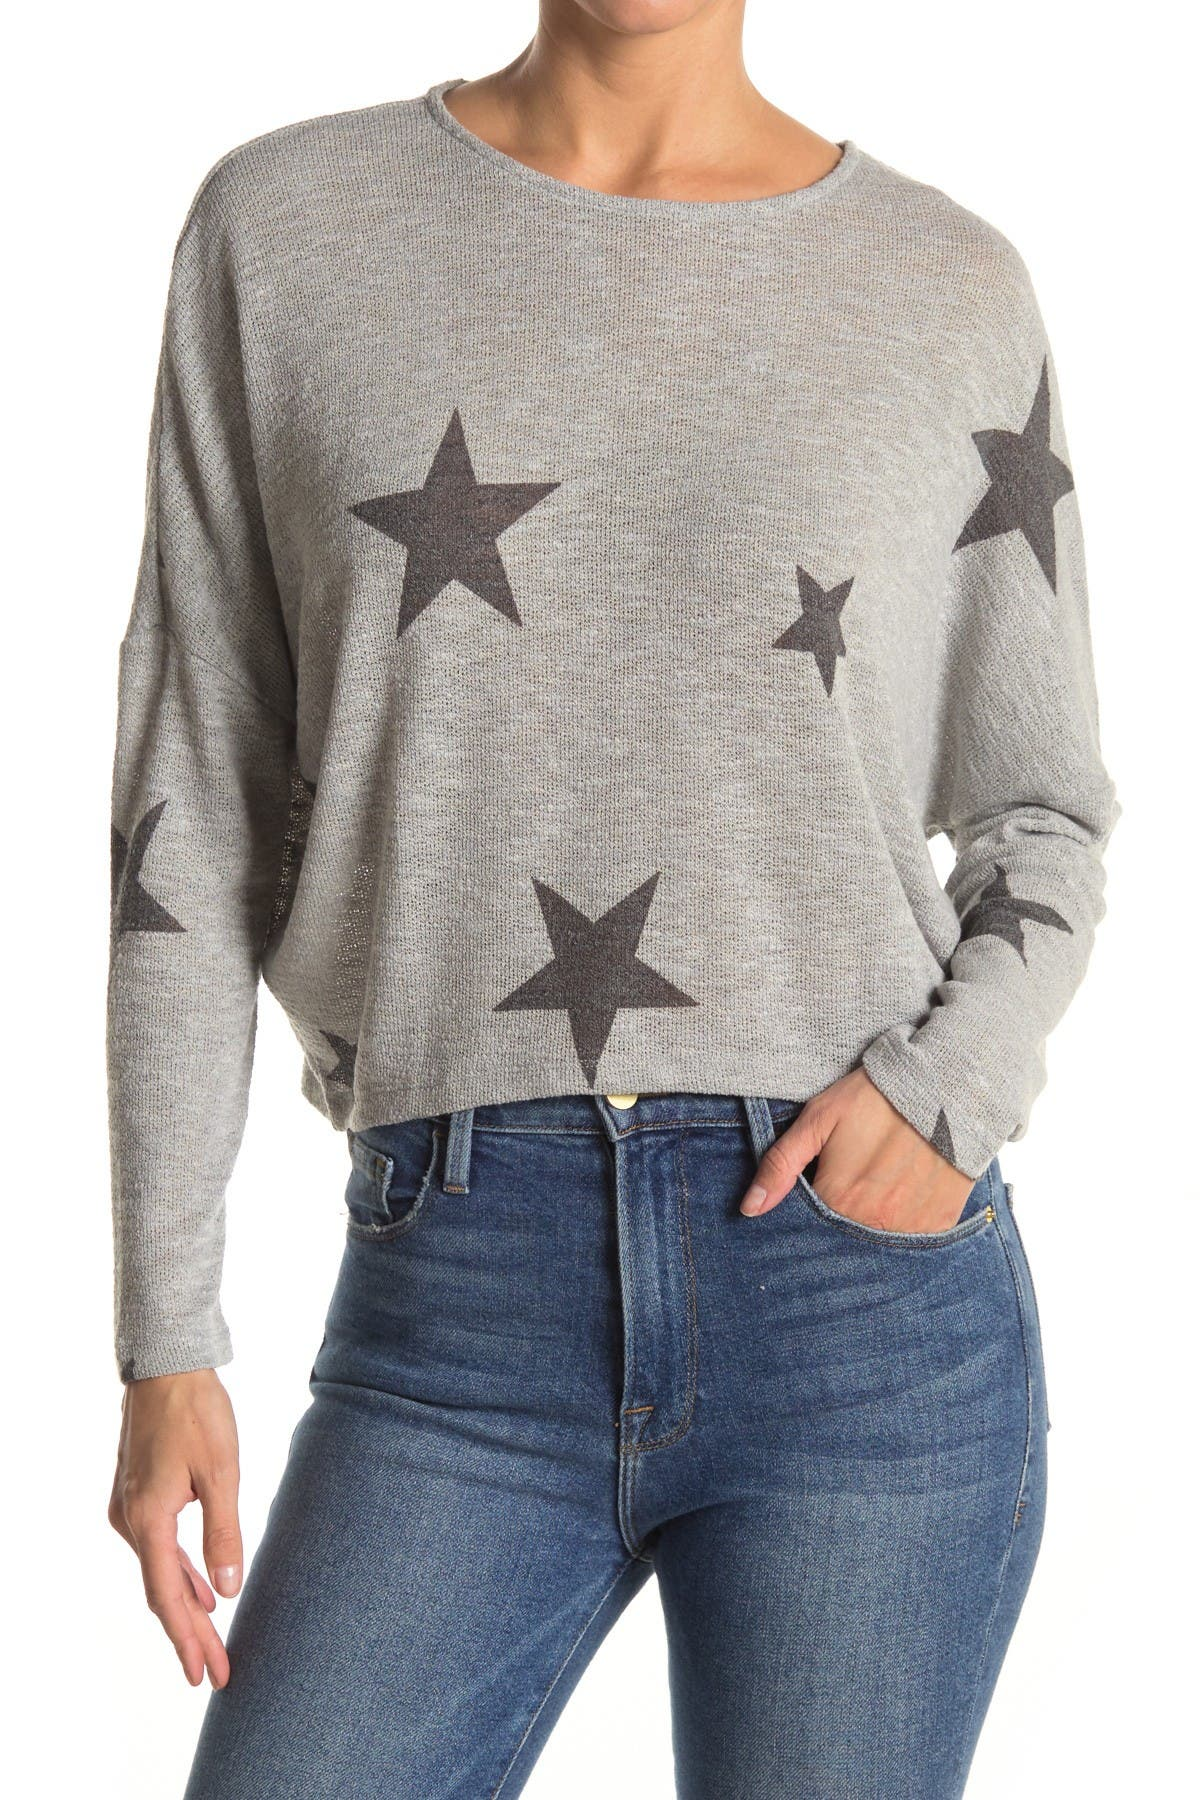 Image of GOOD LUCK GEM Star Print Dolman Pullover